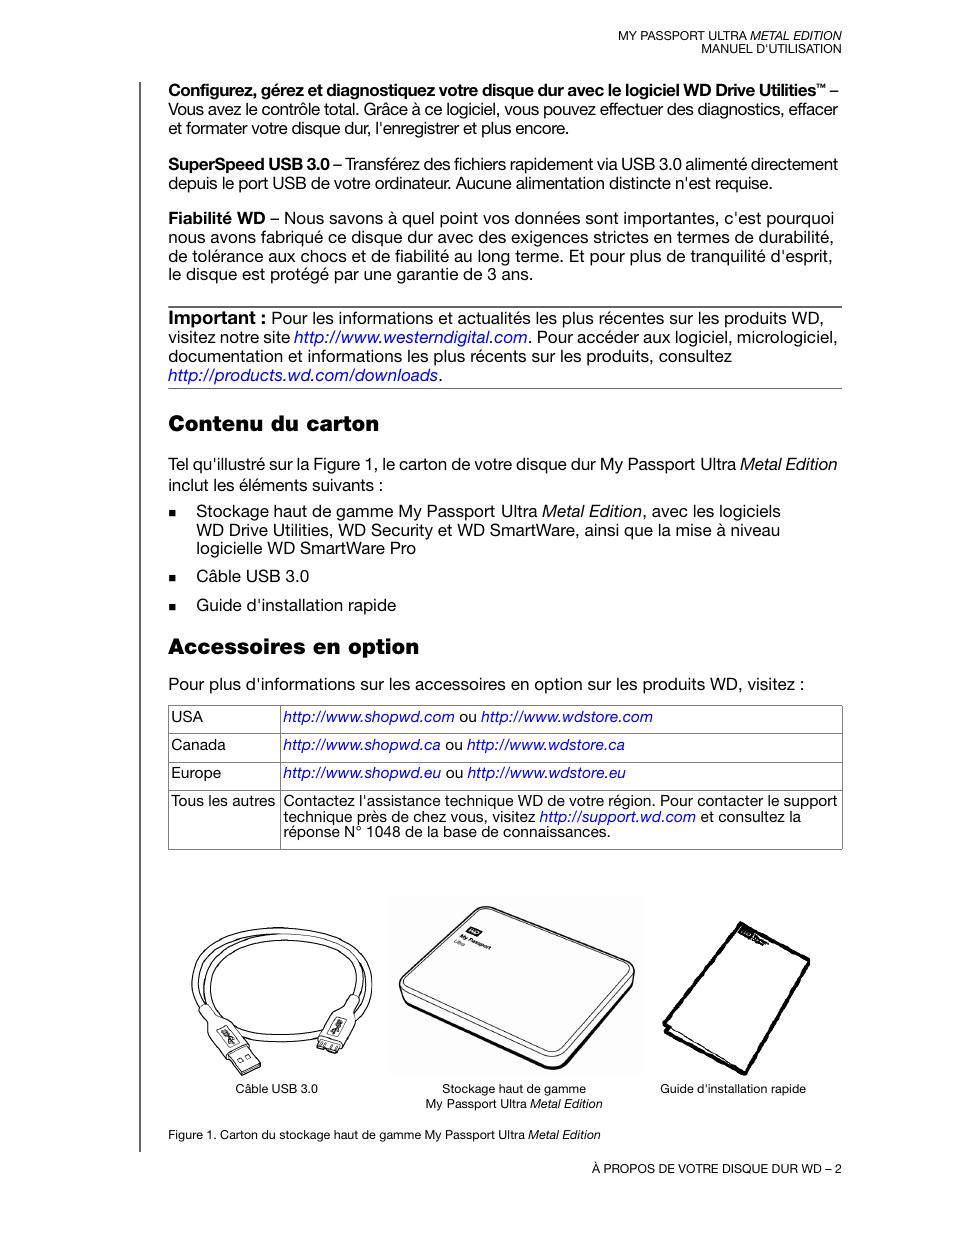 My passport ultra metal edition manual | Western Digital My Passport